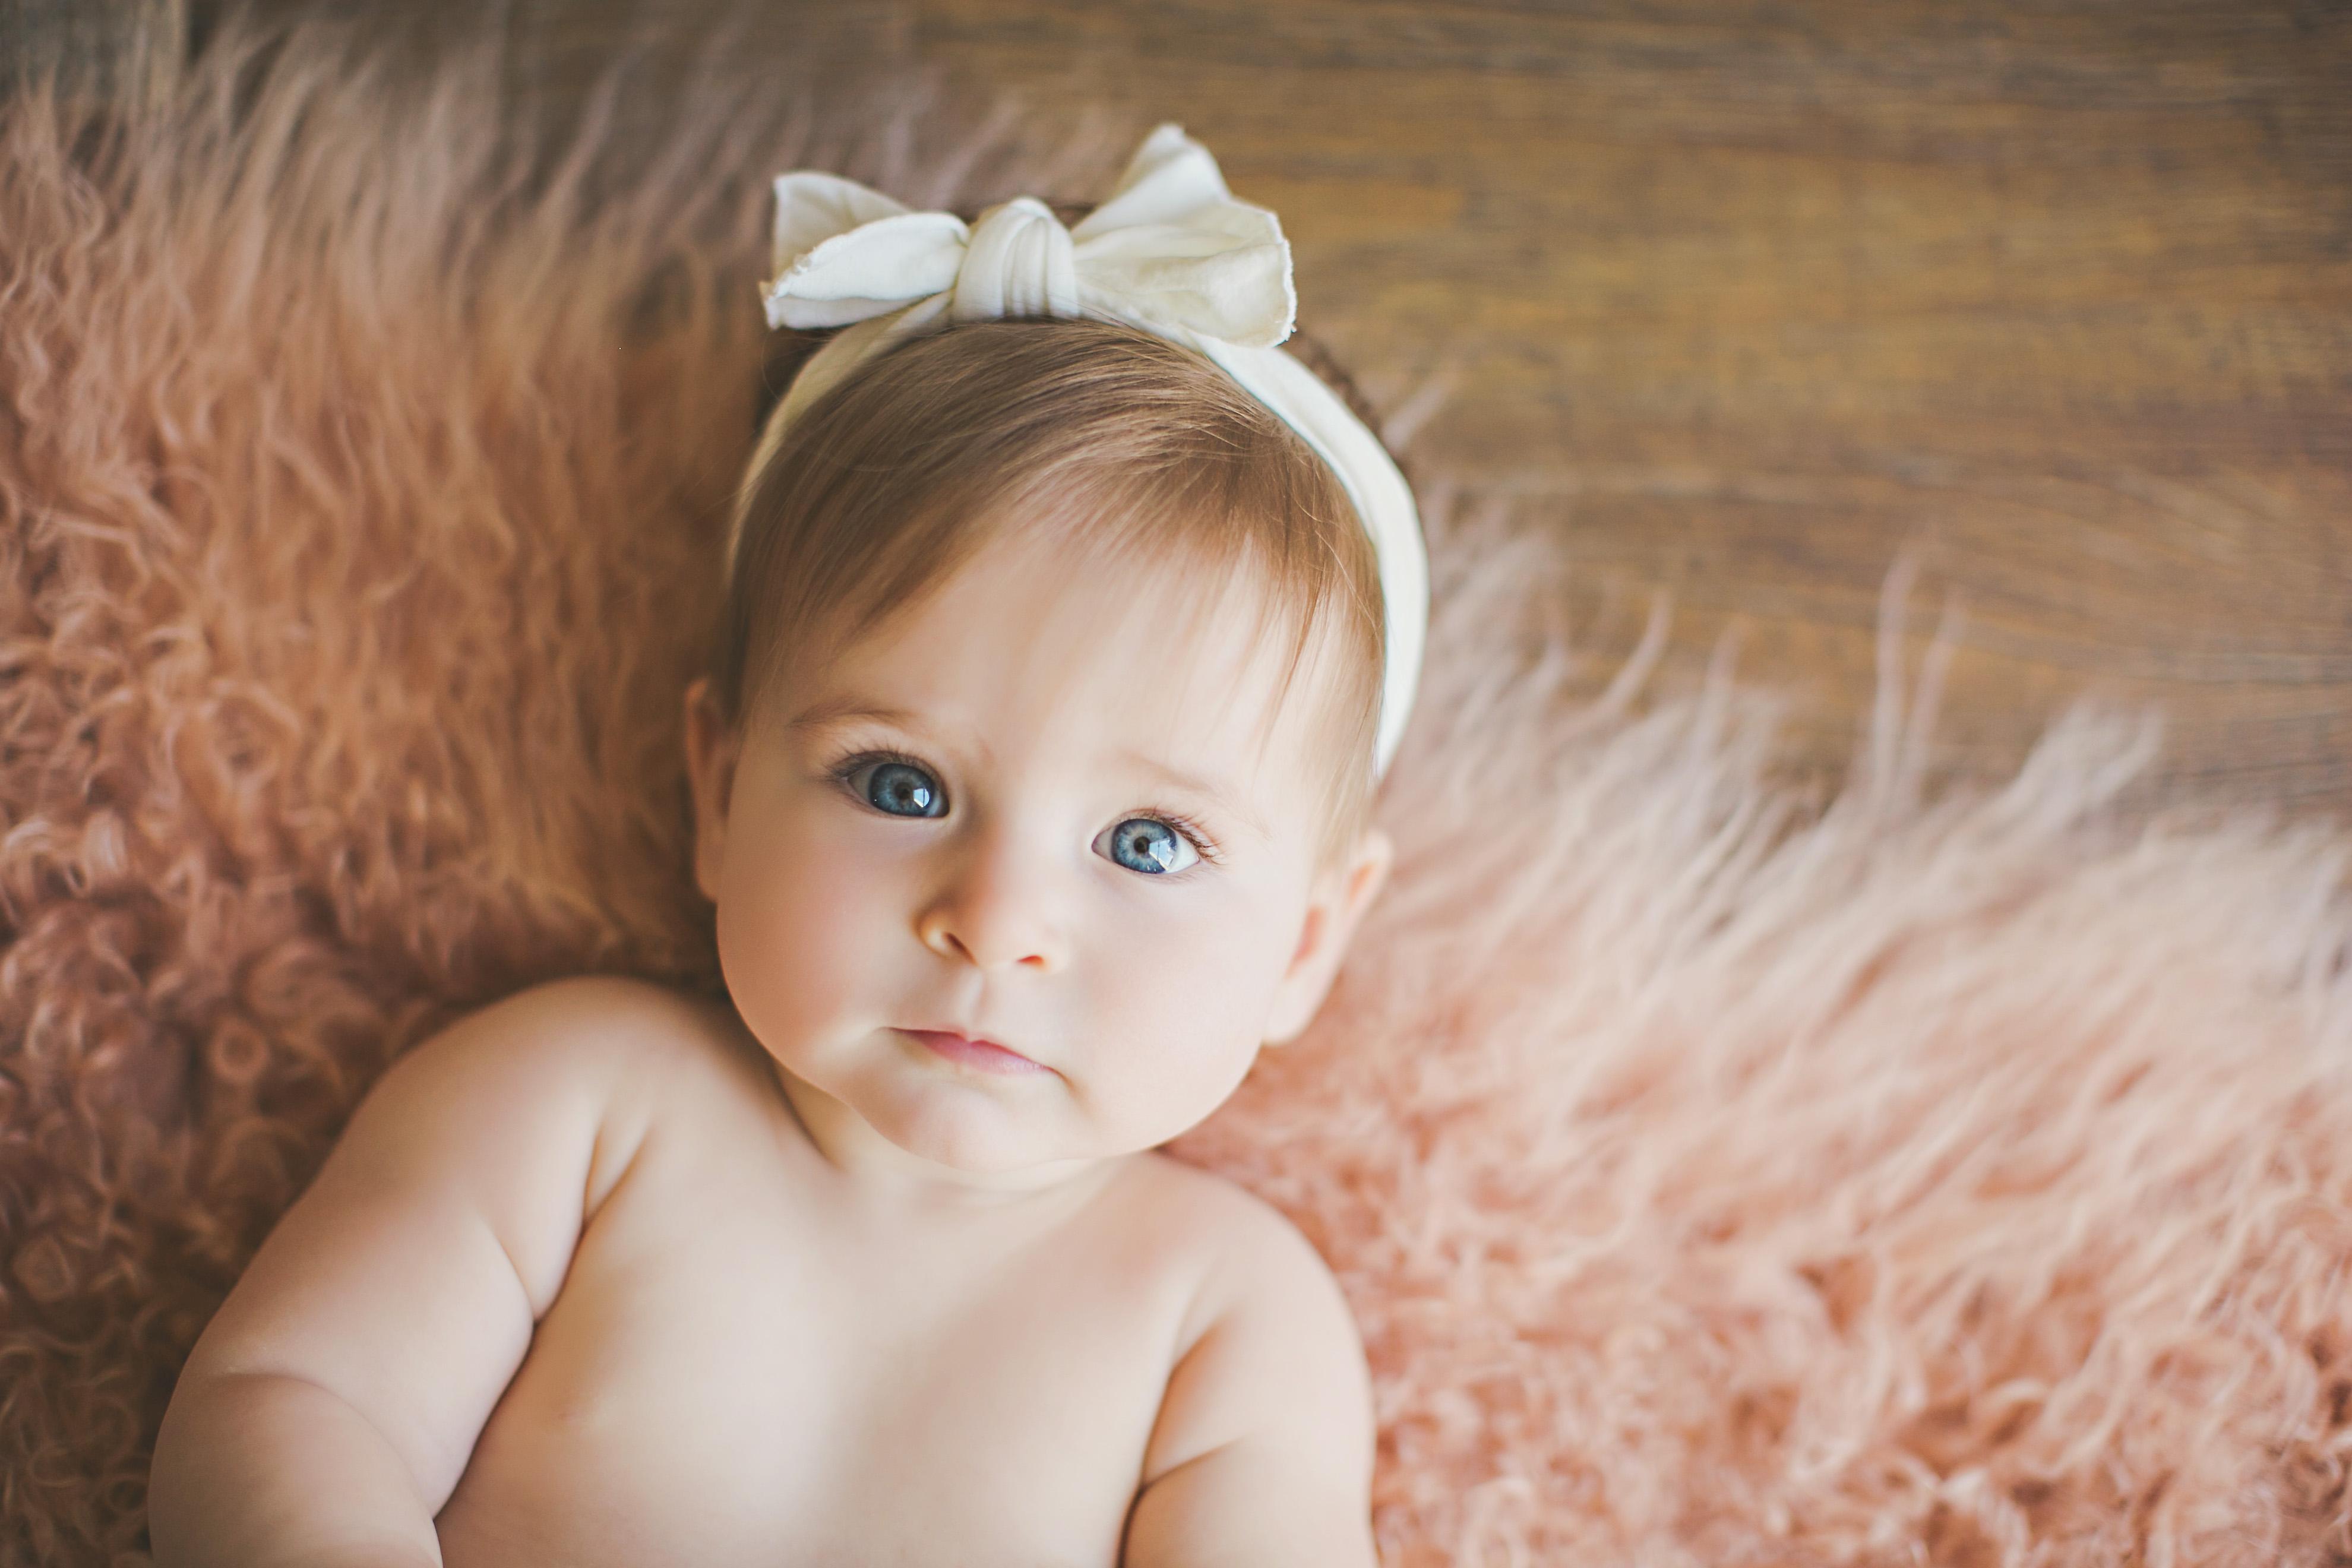 Baby Sleep Training Ideas and Tools